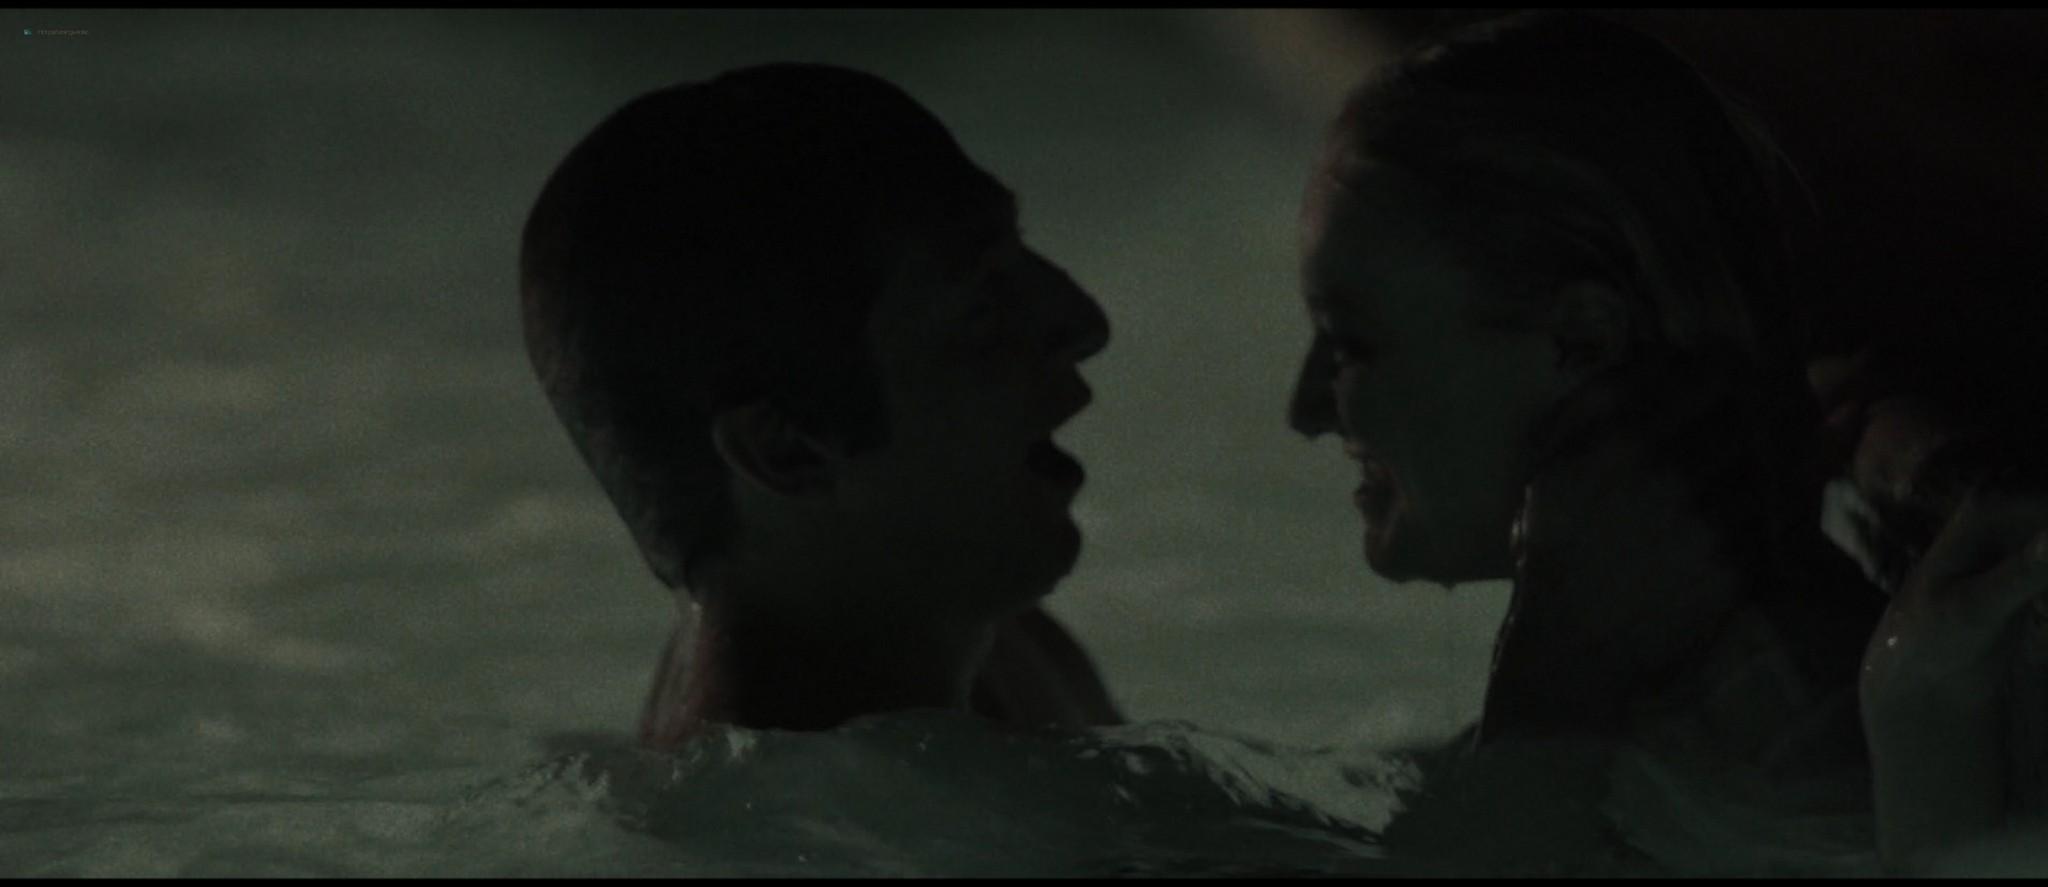 Dakota Fanning hot sex Evan Rachel Wood sexy - Viena and the Fantomes (2020) HD 1080p Web (17)